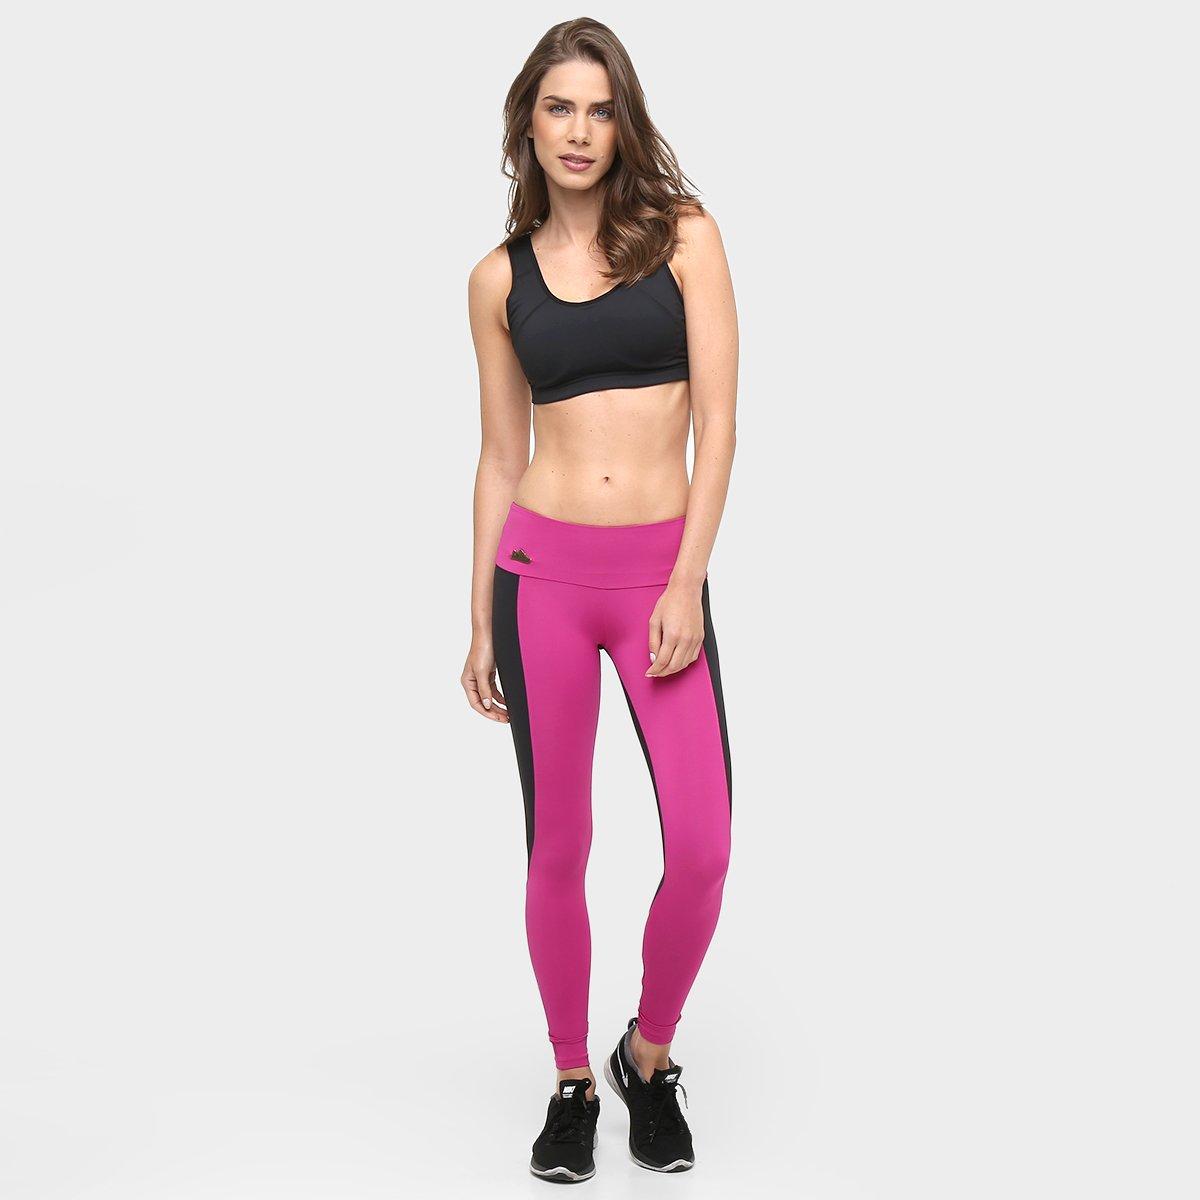 Legging Victória York e Calça Sawary Fitness Preto Feminina 4 Pink wSddqIt